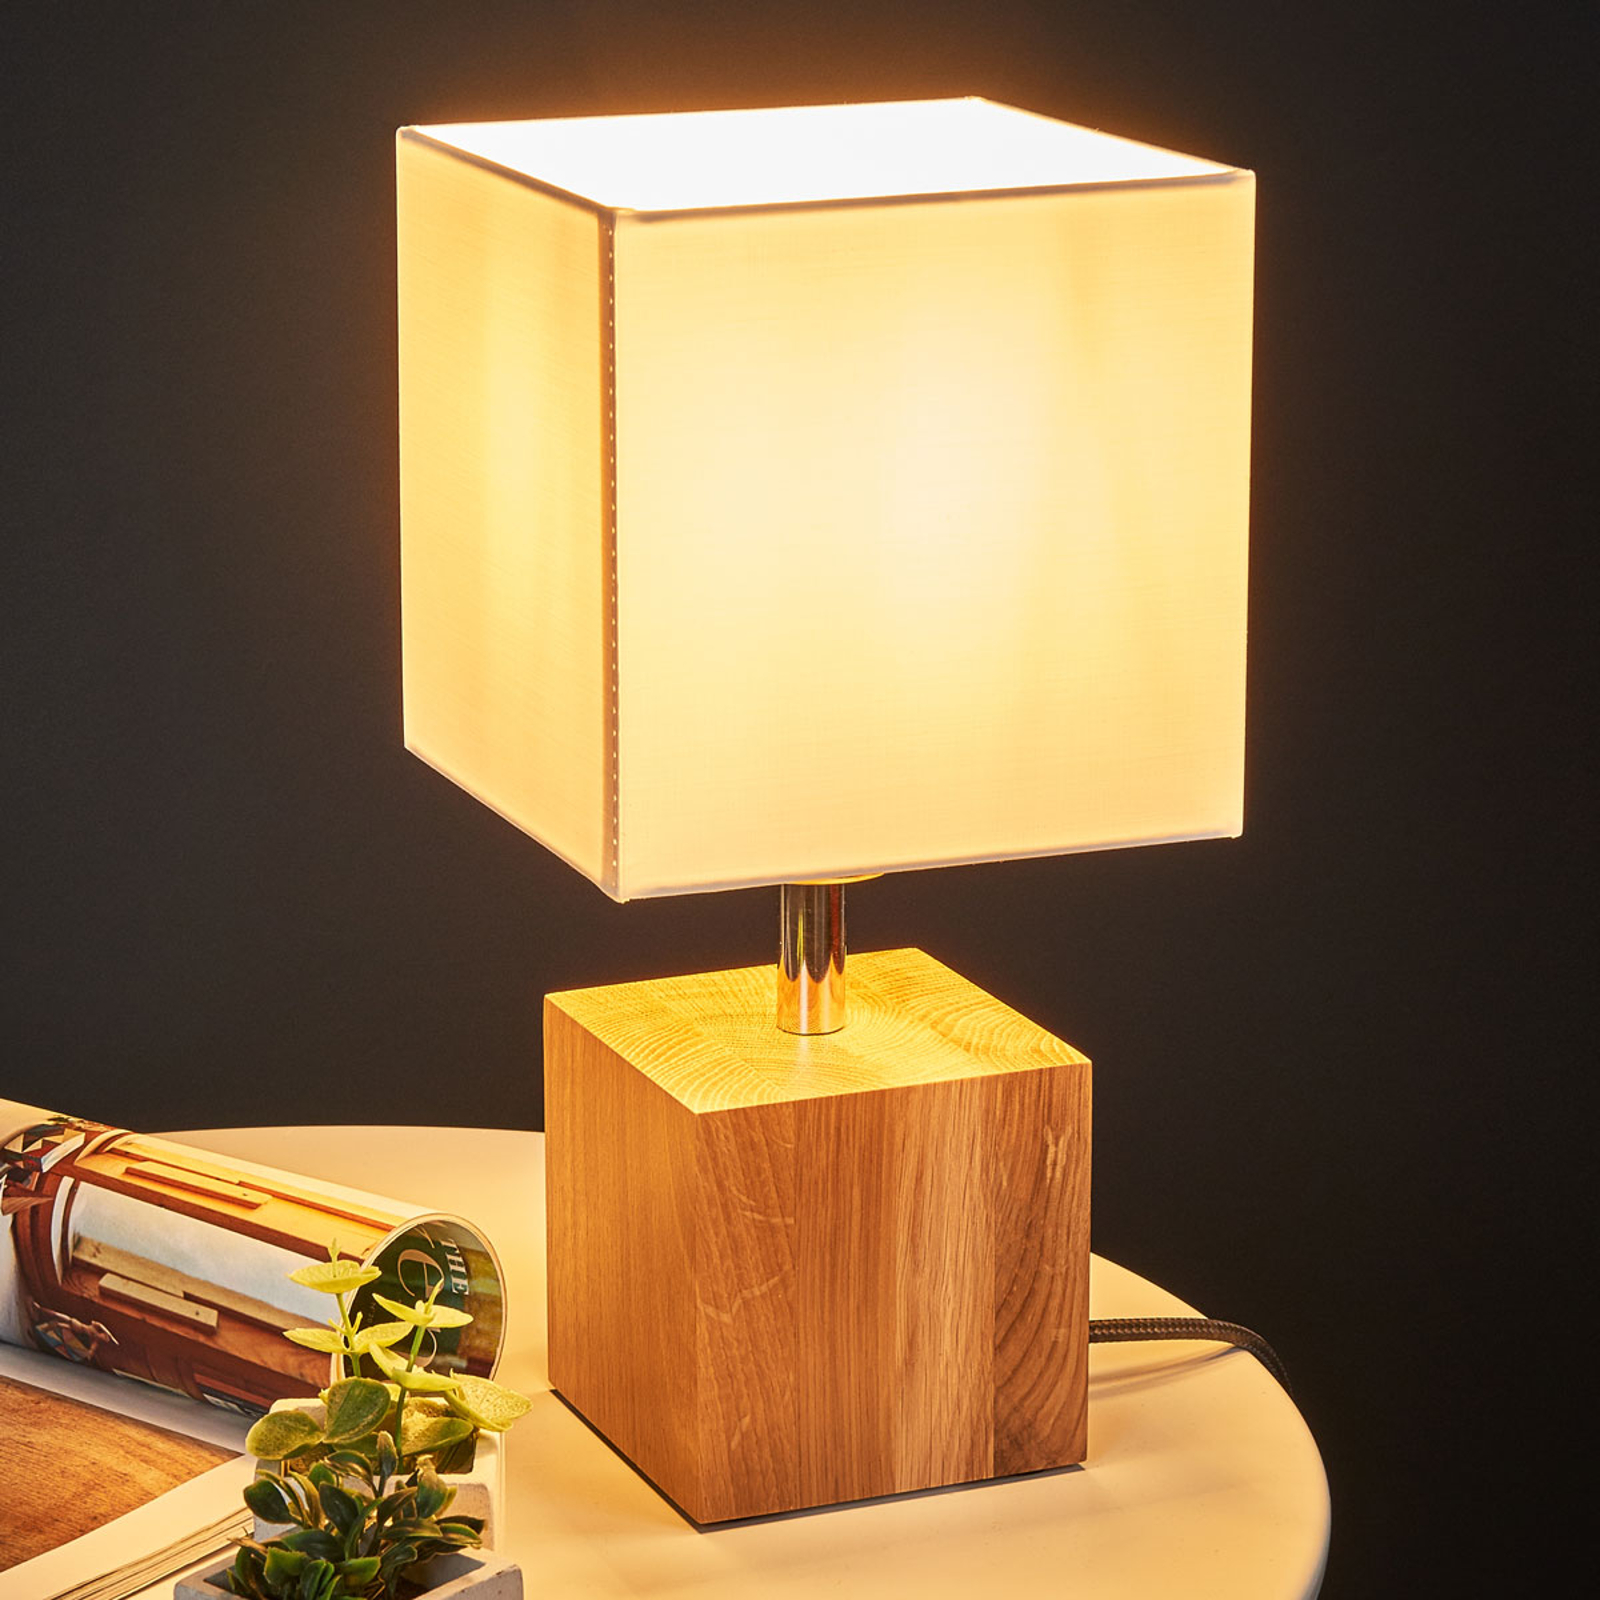 Tafellamp Trongo dobbelsteen geolied lampenkap